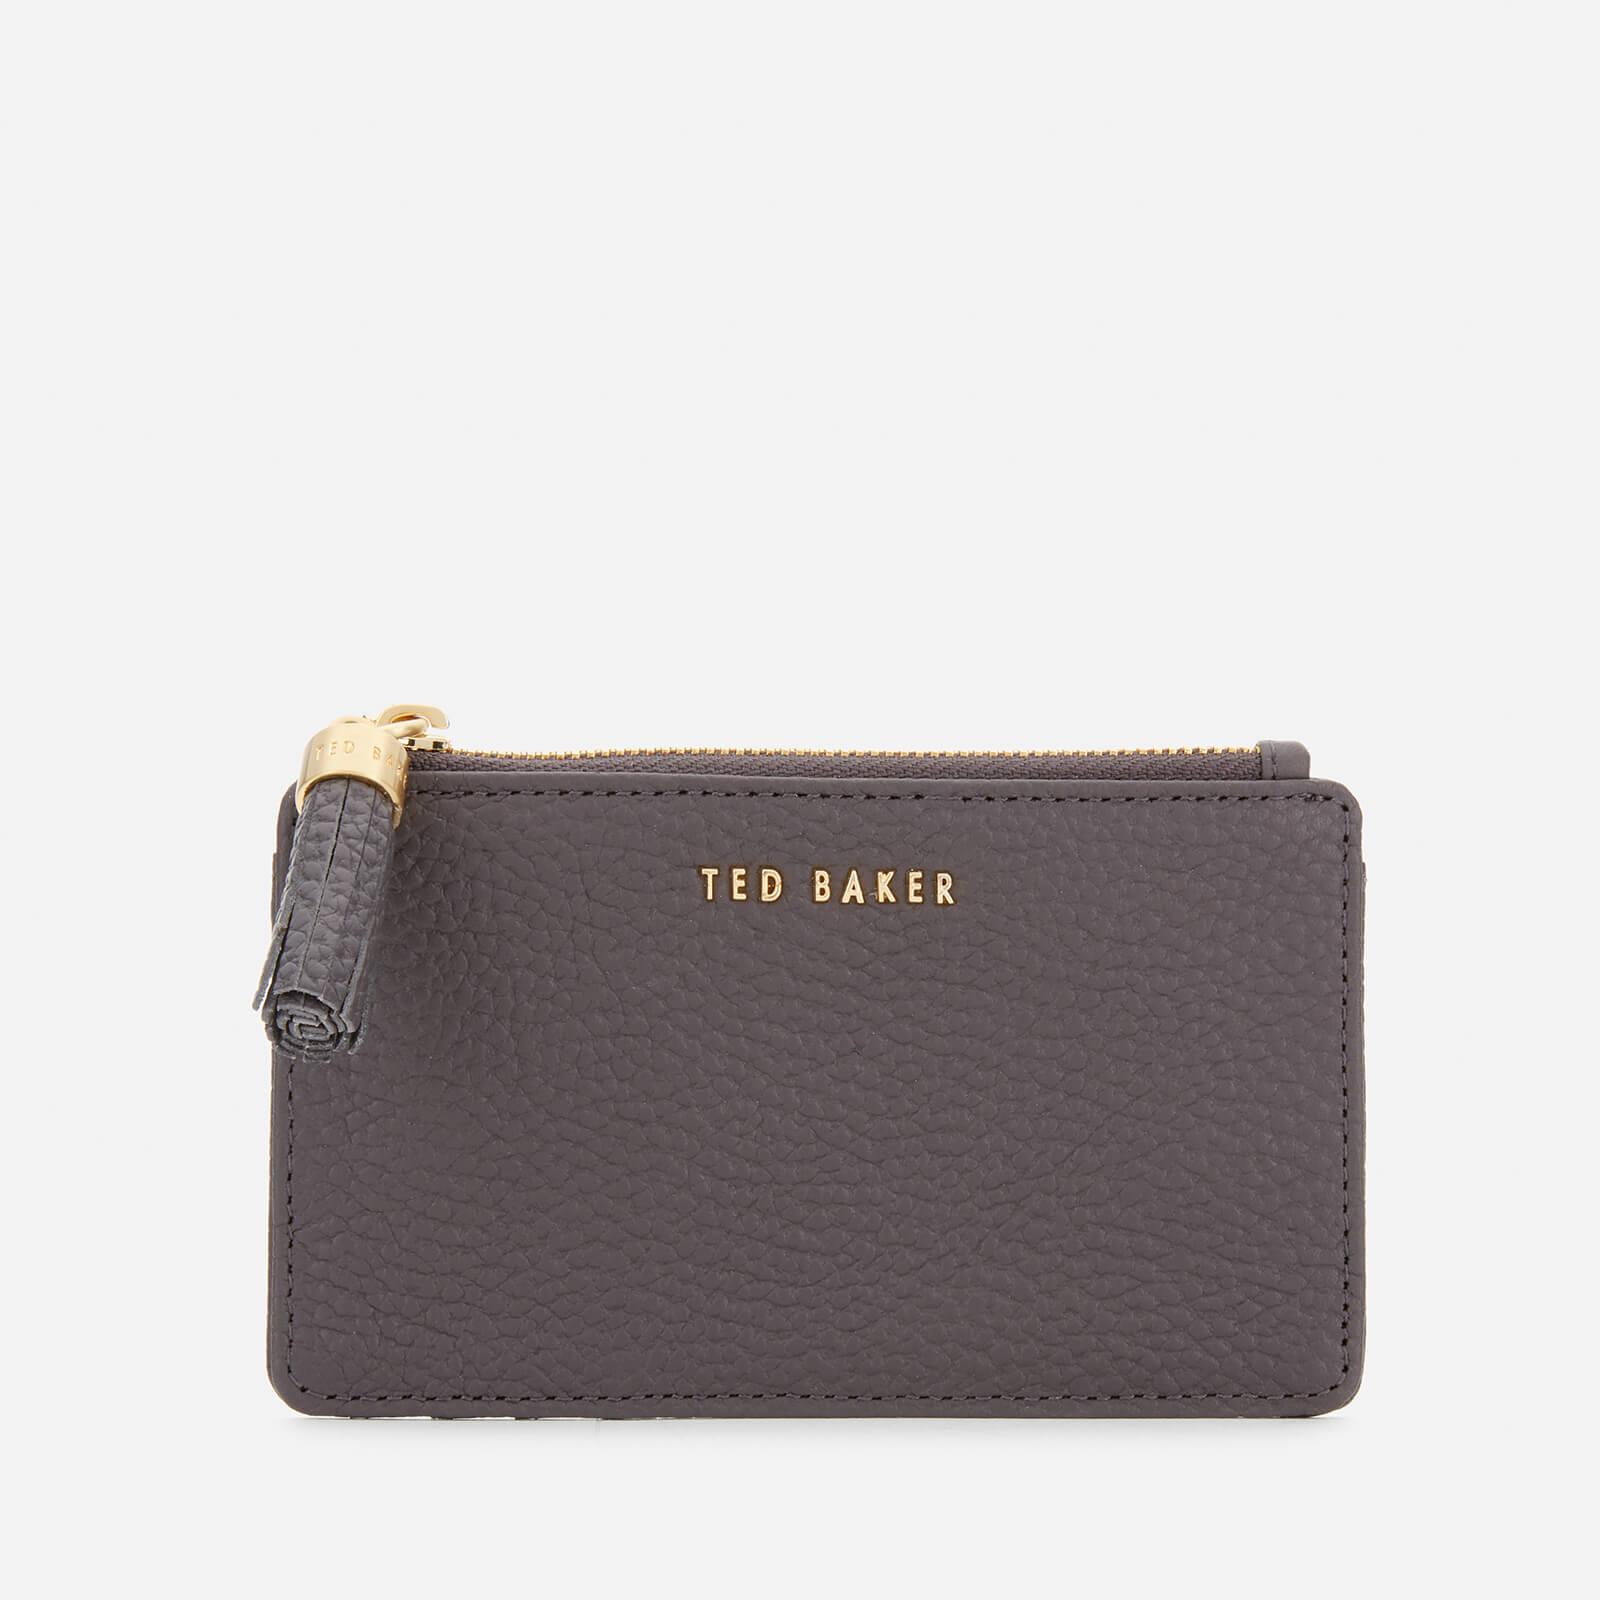 Ted Baker Women's Sydnee Tassel Credit Card Holder - Charcoal